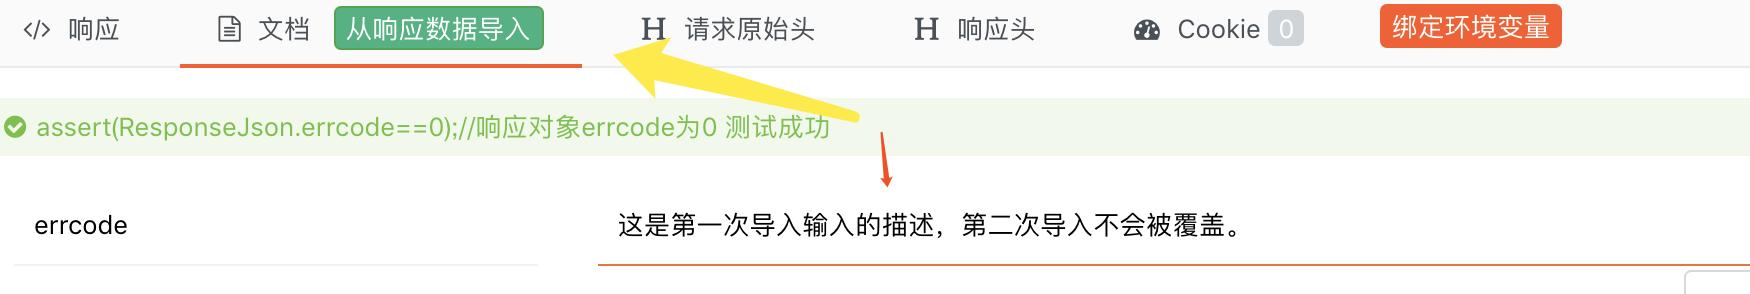 ApiPost「接口调试接口文档生成工具」 V2.4.1已发布